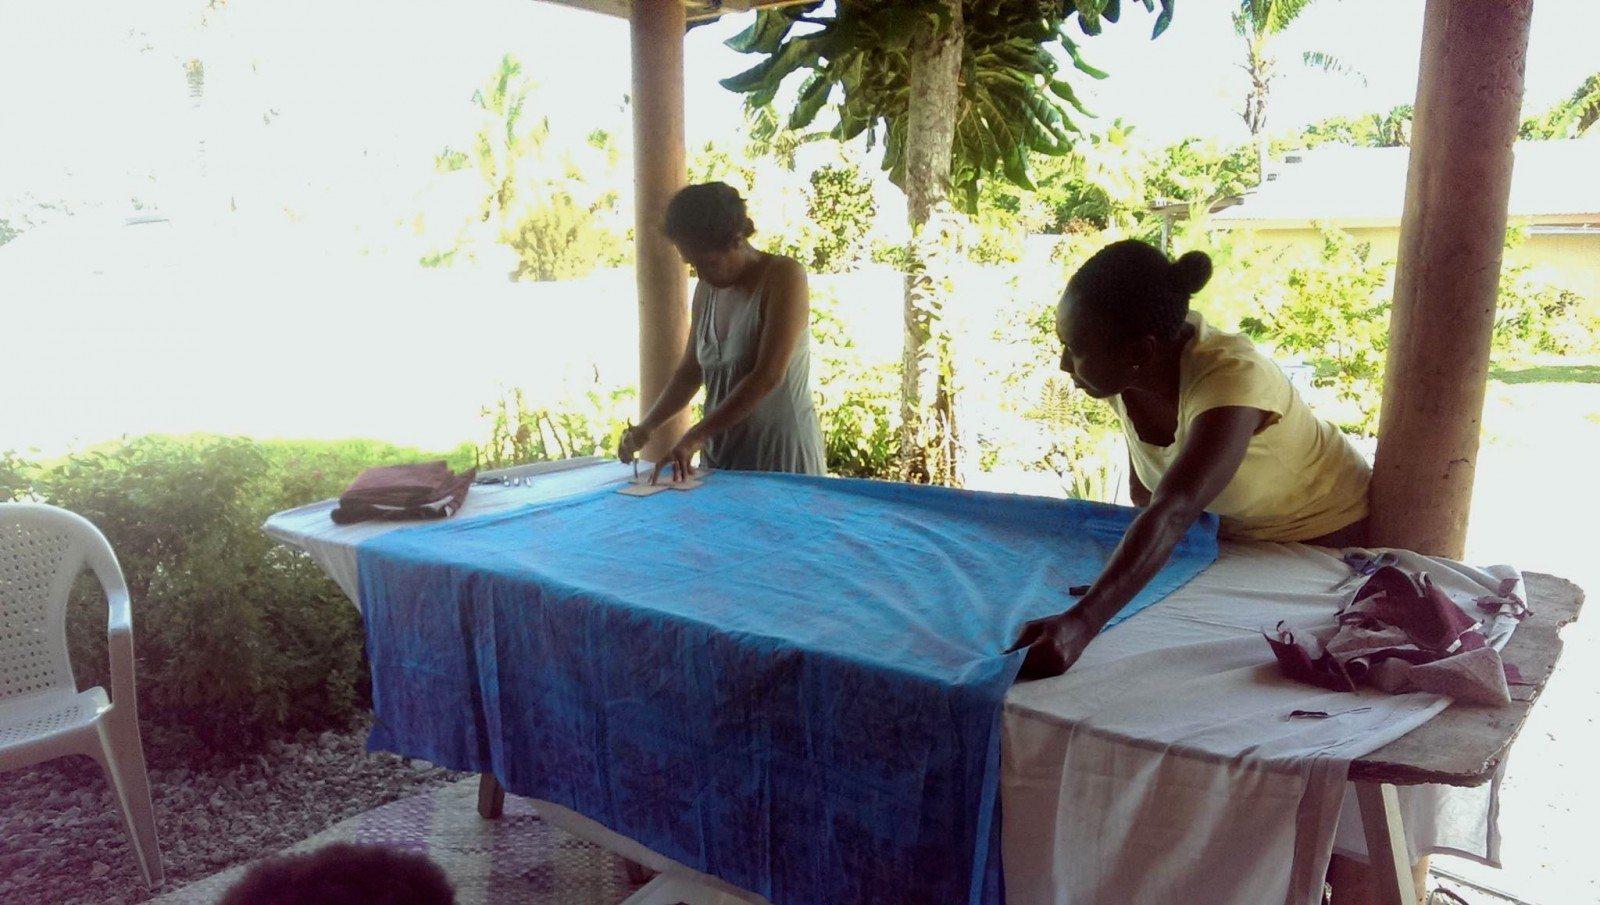 fabric cutting at mamma's laef